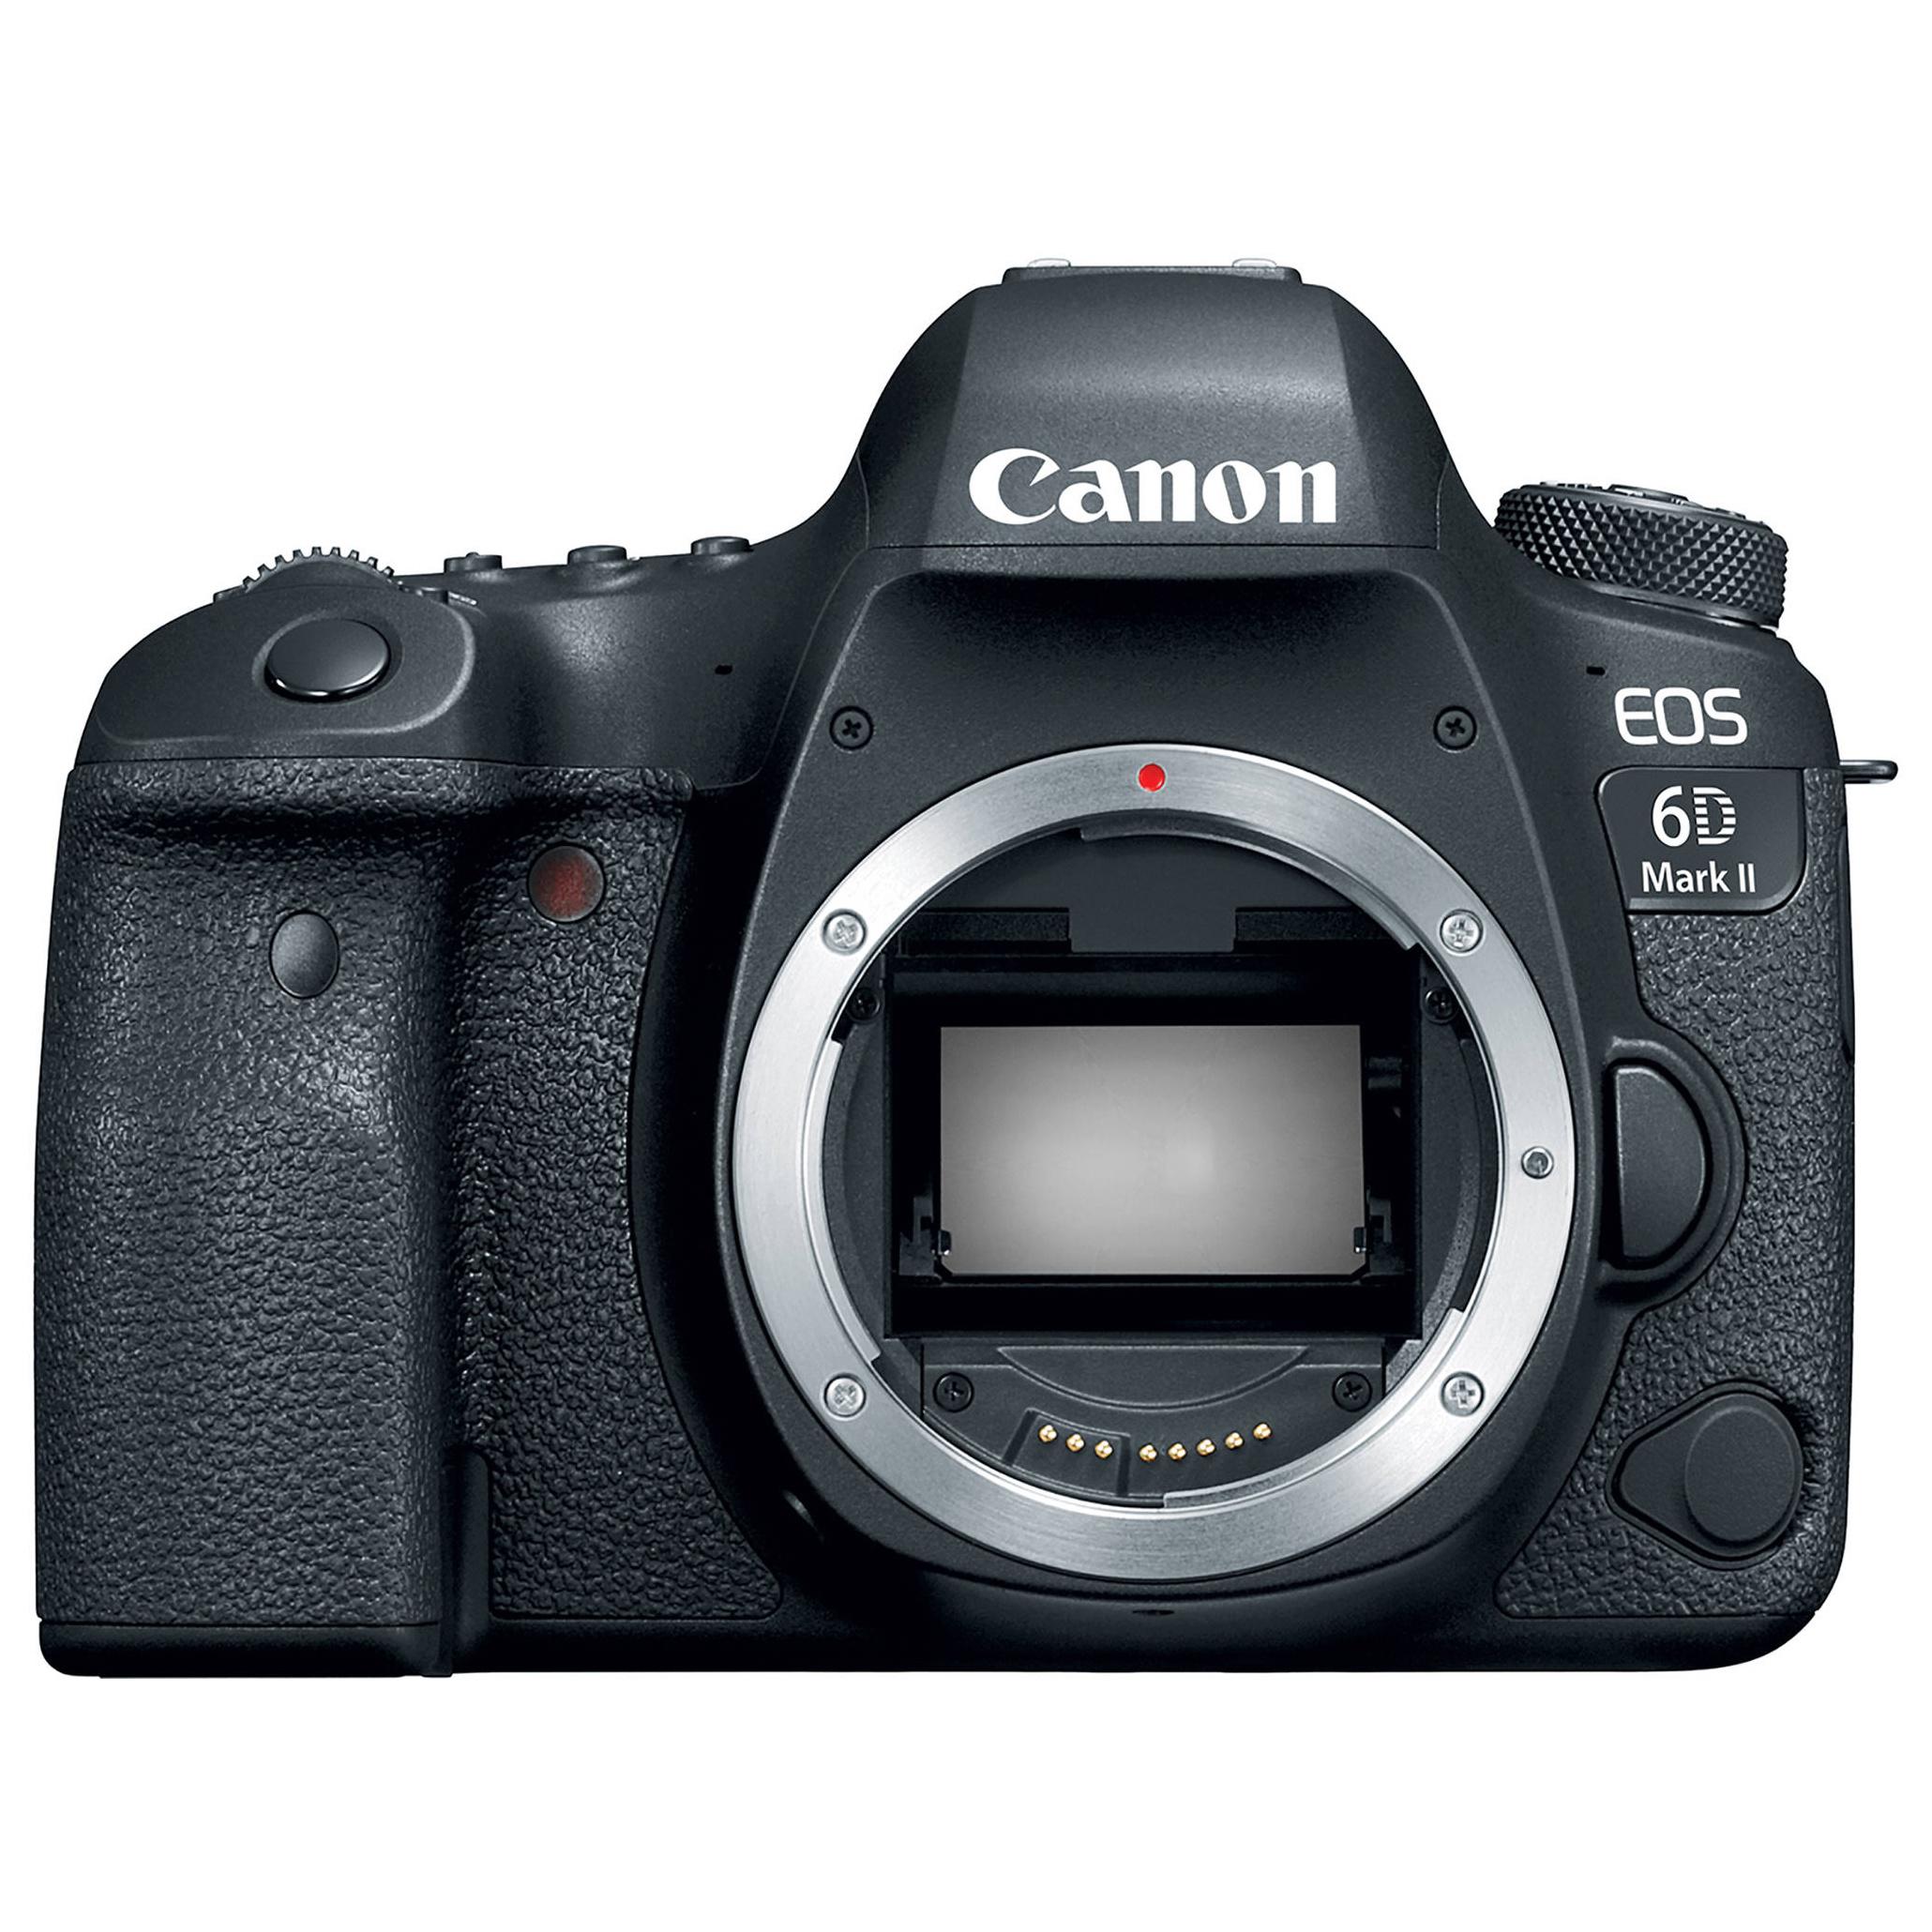 Зеркальный фотоаппарат Canon EOS 6D Mark II Black фото